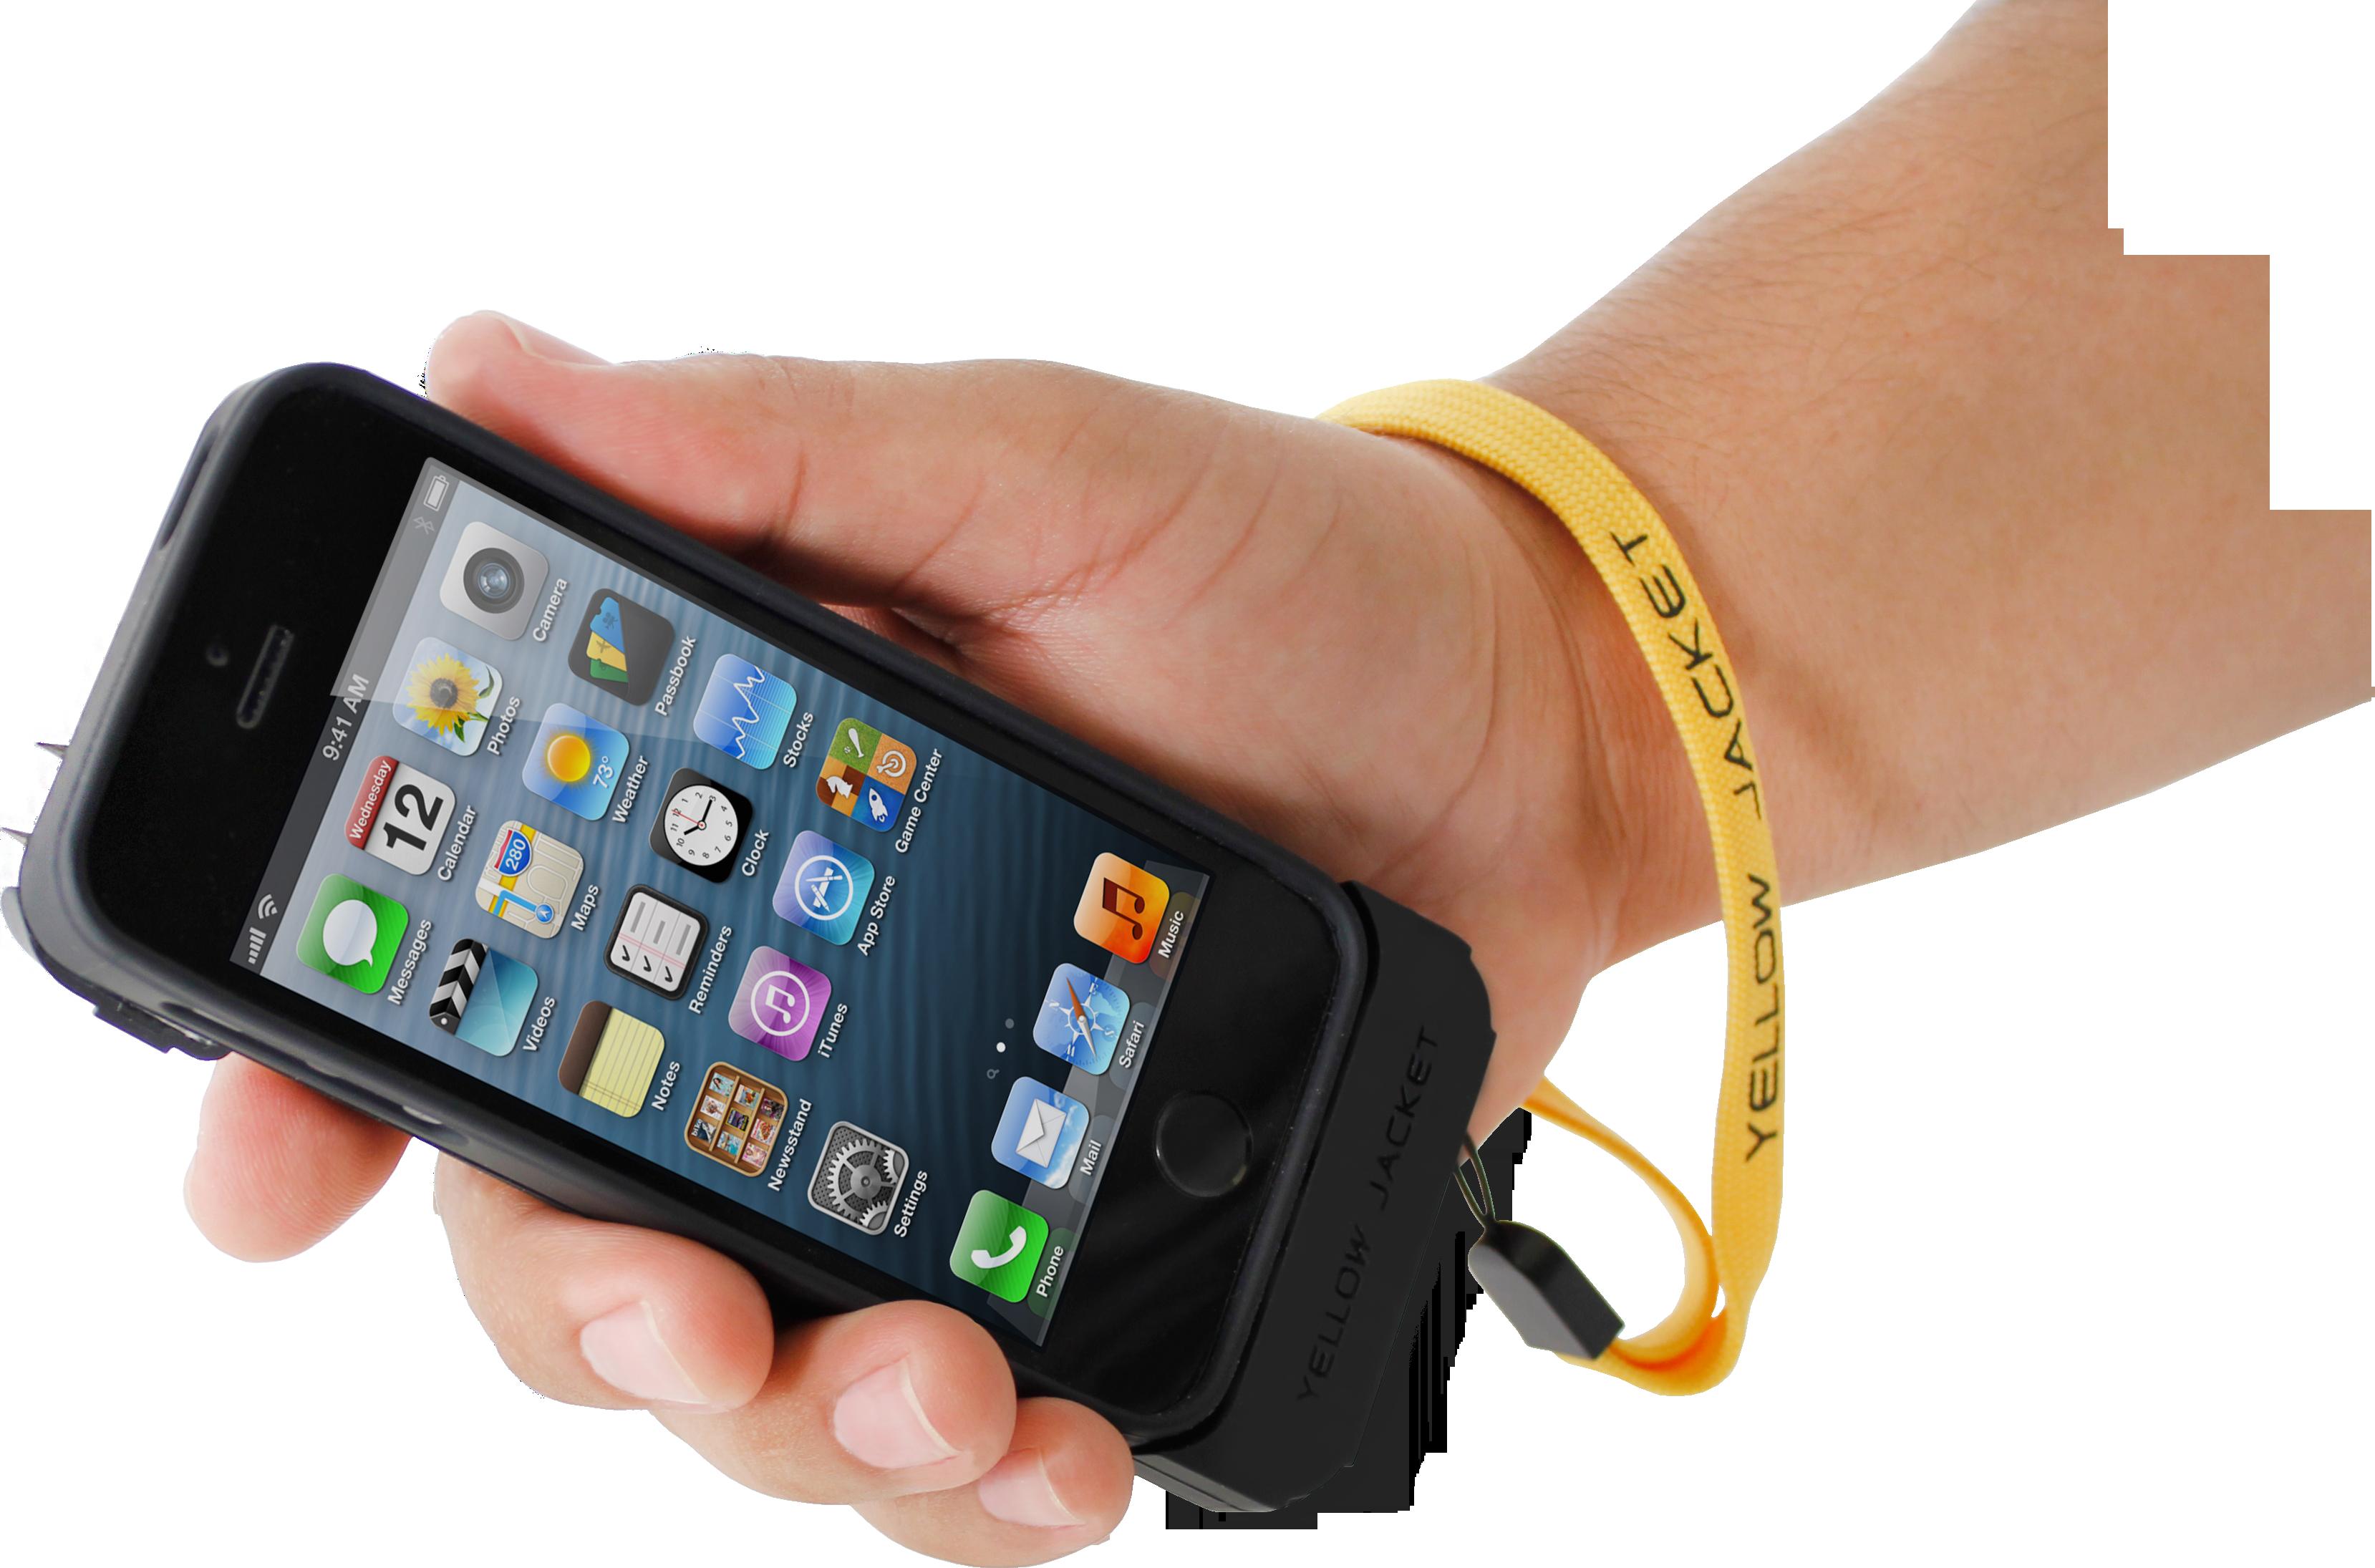 iPhone Stun Gun Case Yellow Jacket iPhone 5/5S/SE Case: Stun Gun ...